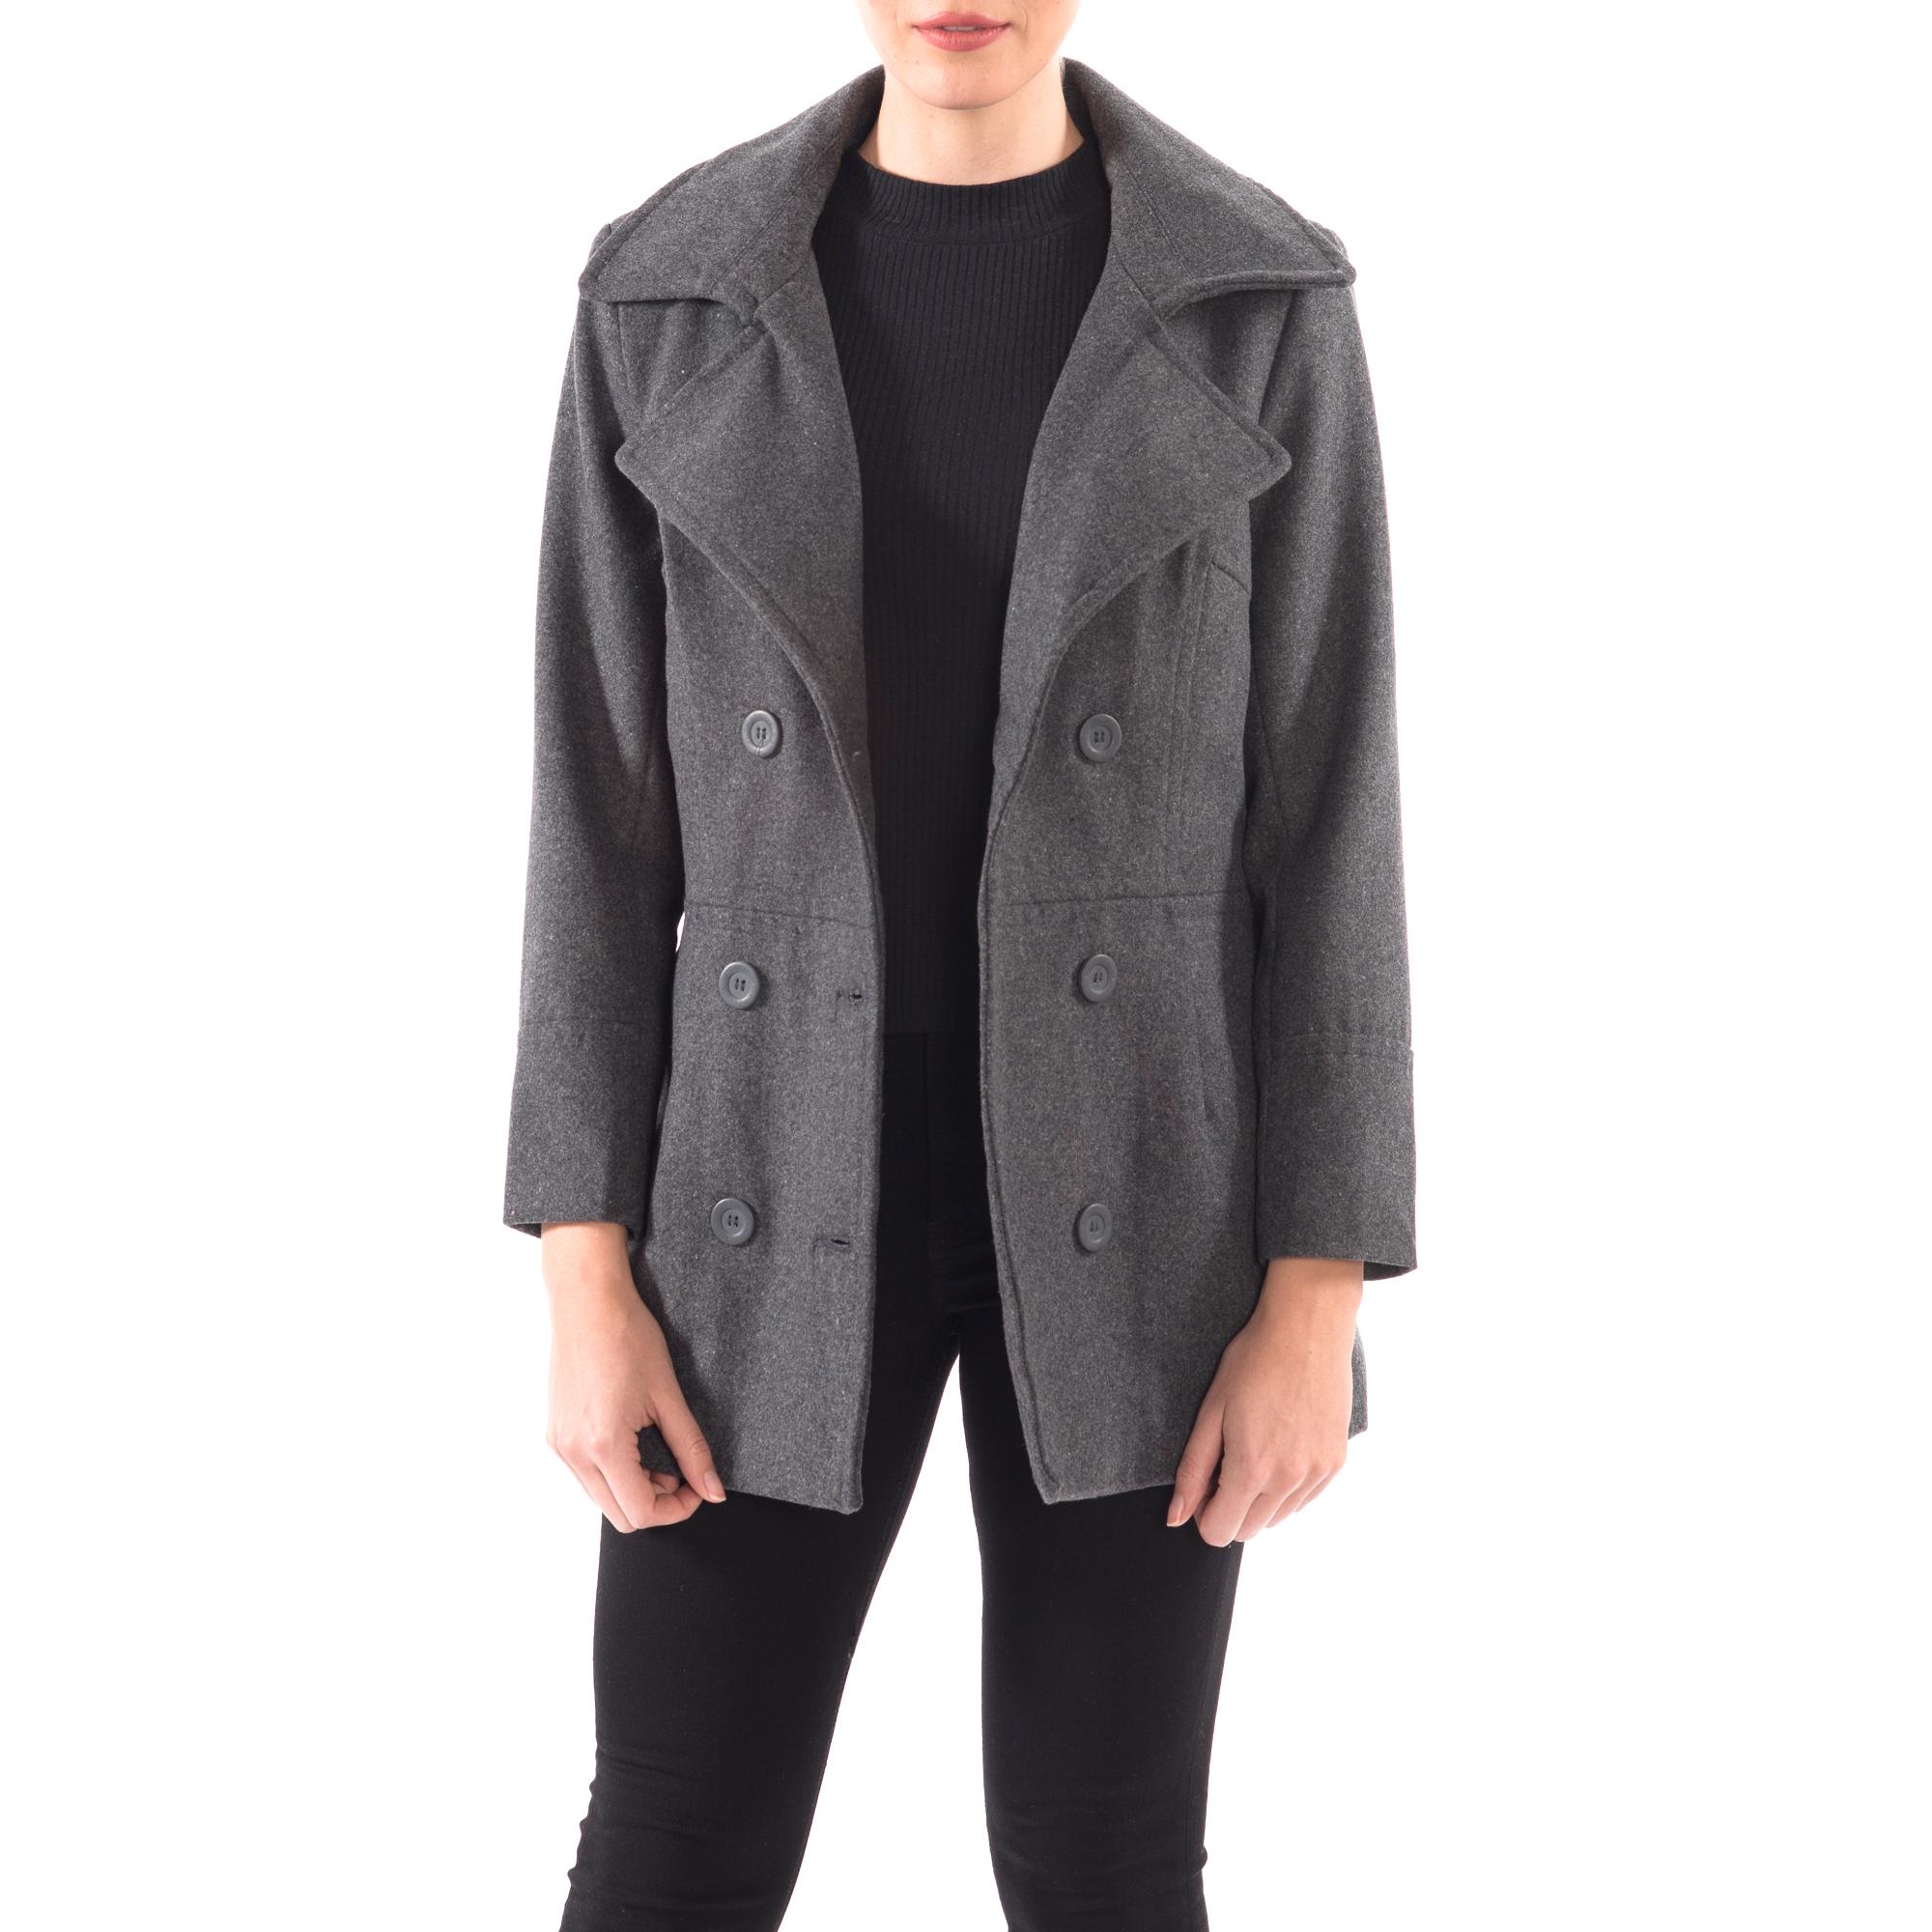 Alpine-Swiss-Emma-Womens-Peacoat-Jacket-Wool-Blazer-Double-Breasted-Overcoat-New thumbnail 37